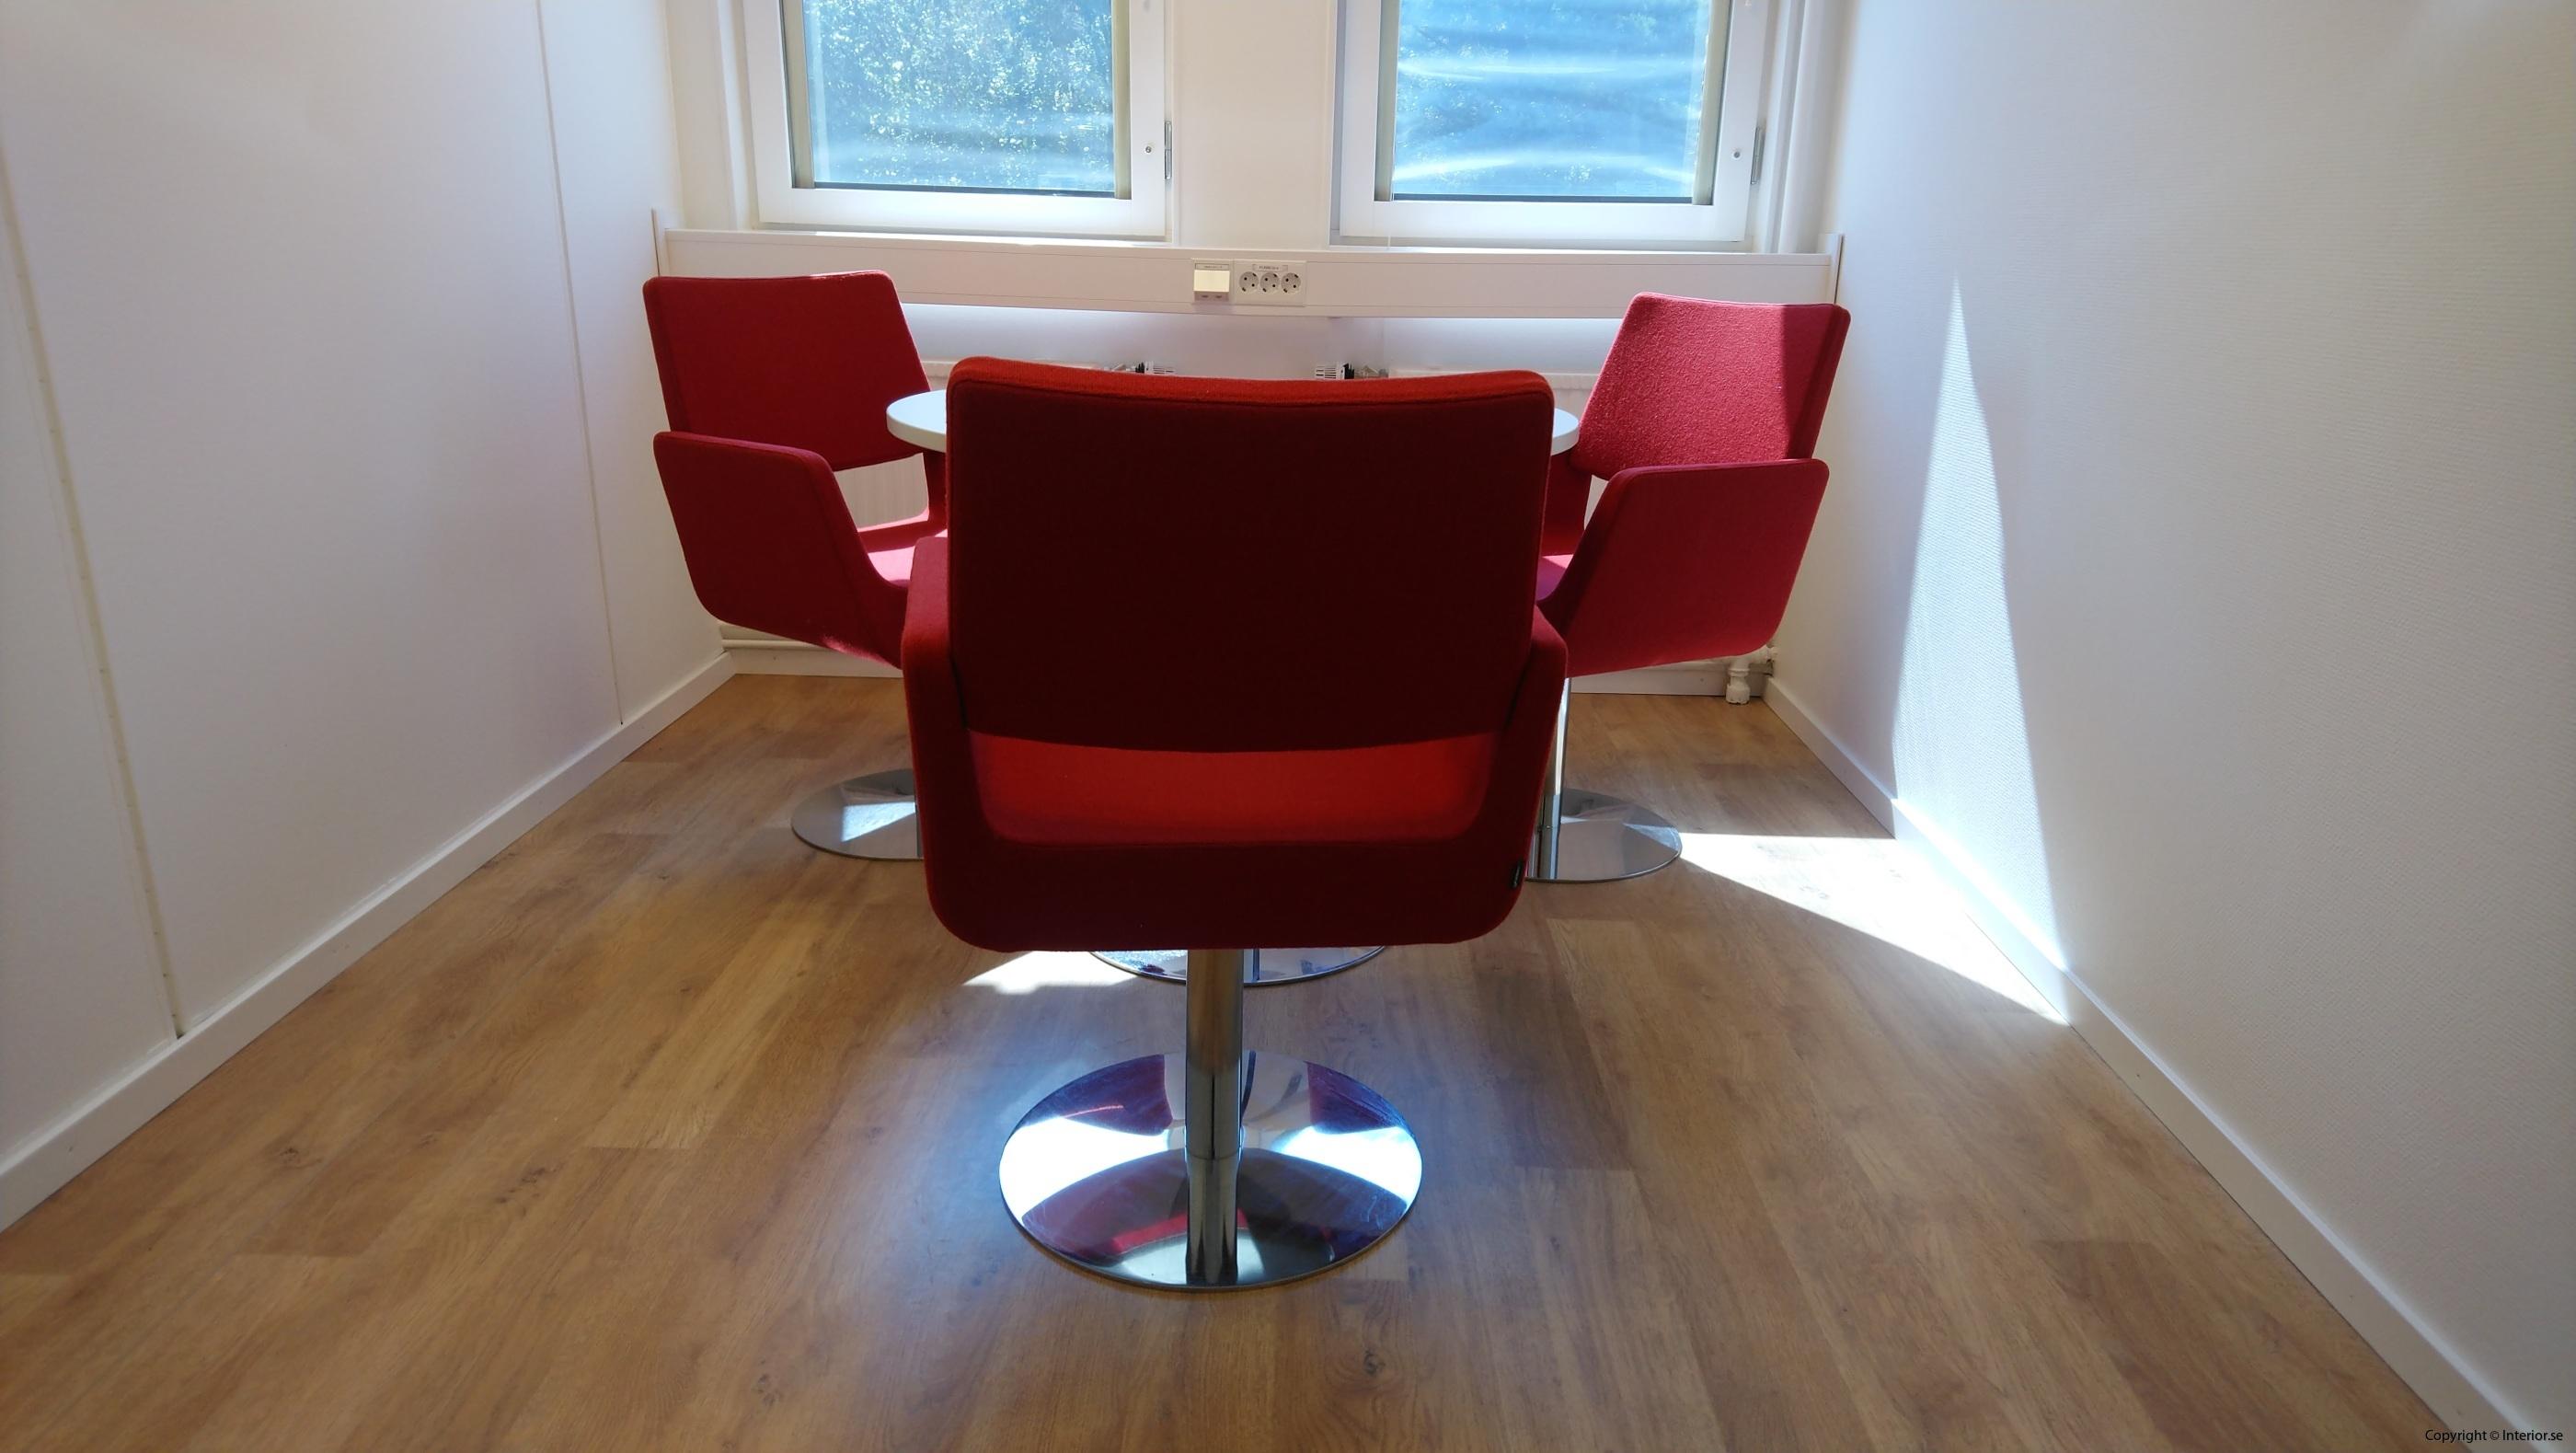 Loungegrupp, SA Möbler materia - 3 fåtöljer + bord - Loungemöbler begagnade designmöbler